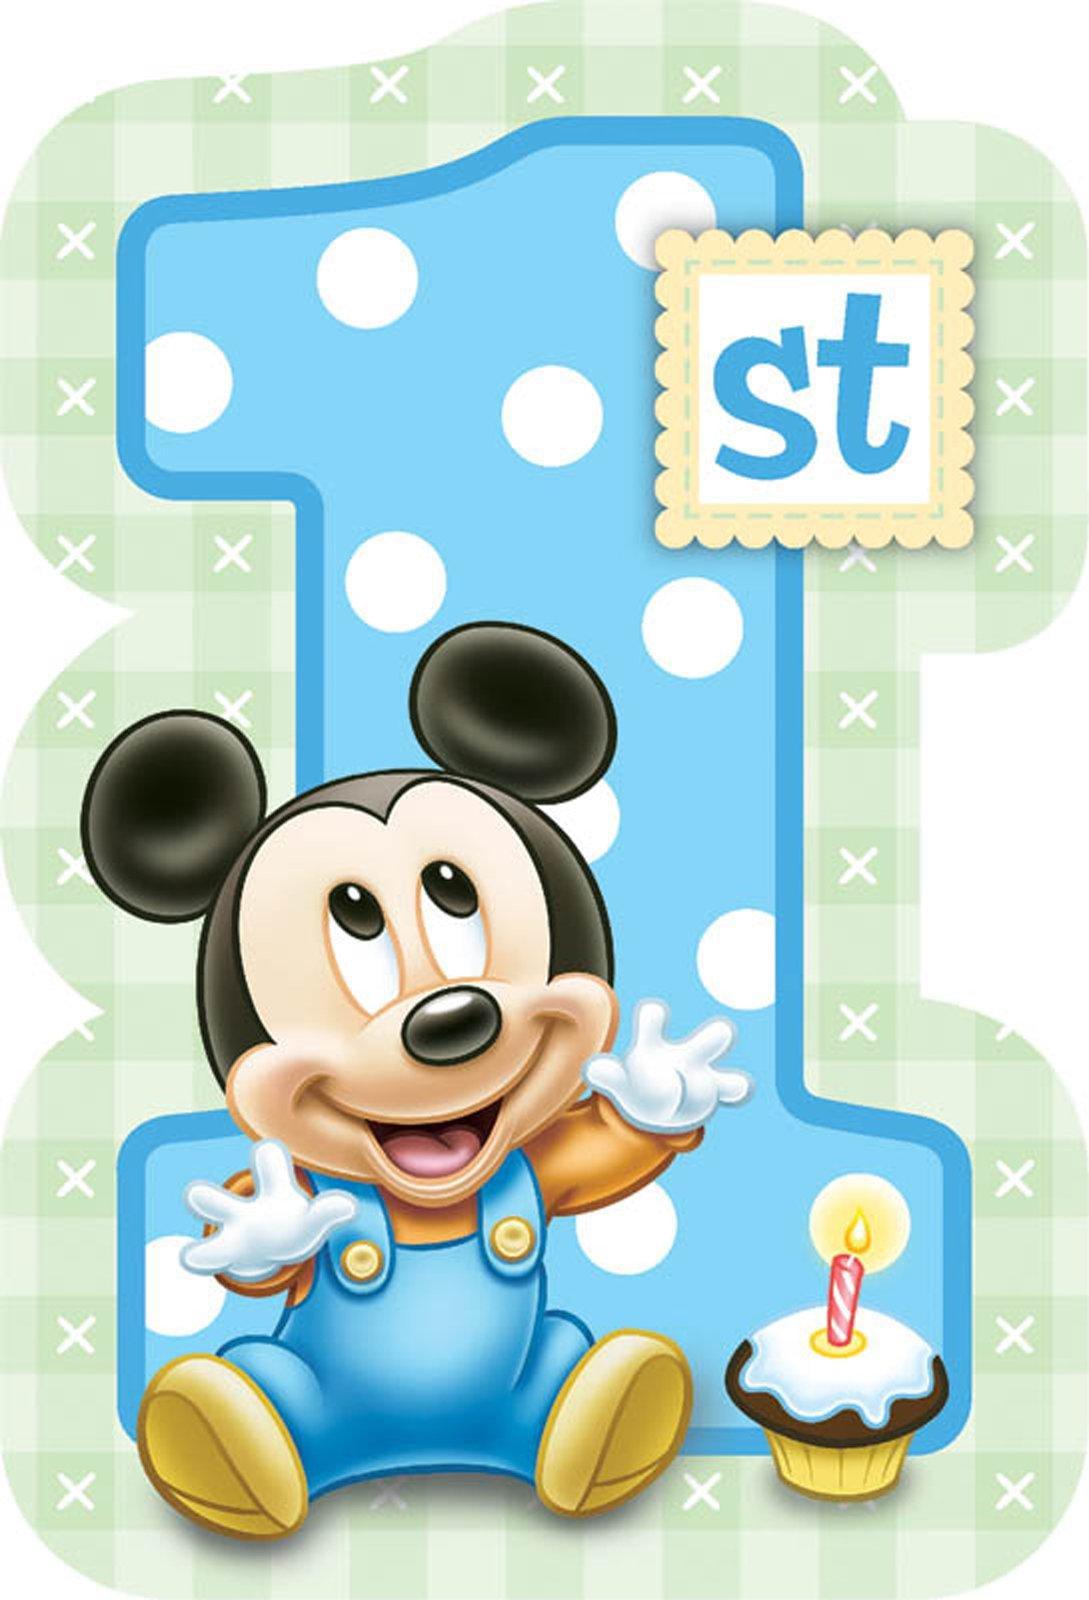 Disney mickeys 1st birthday invitations 8pk walmart filmwisefo Images